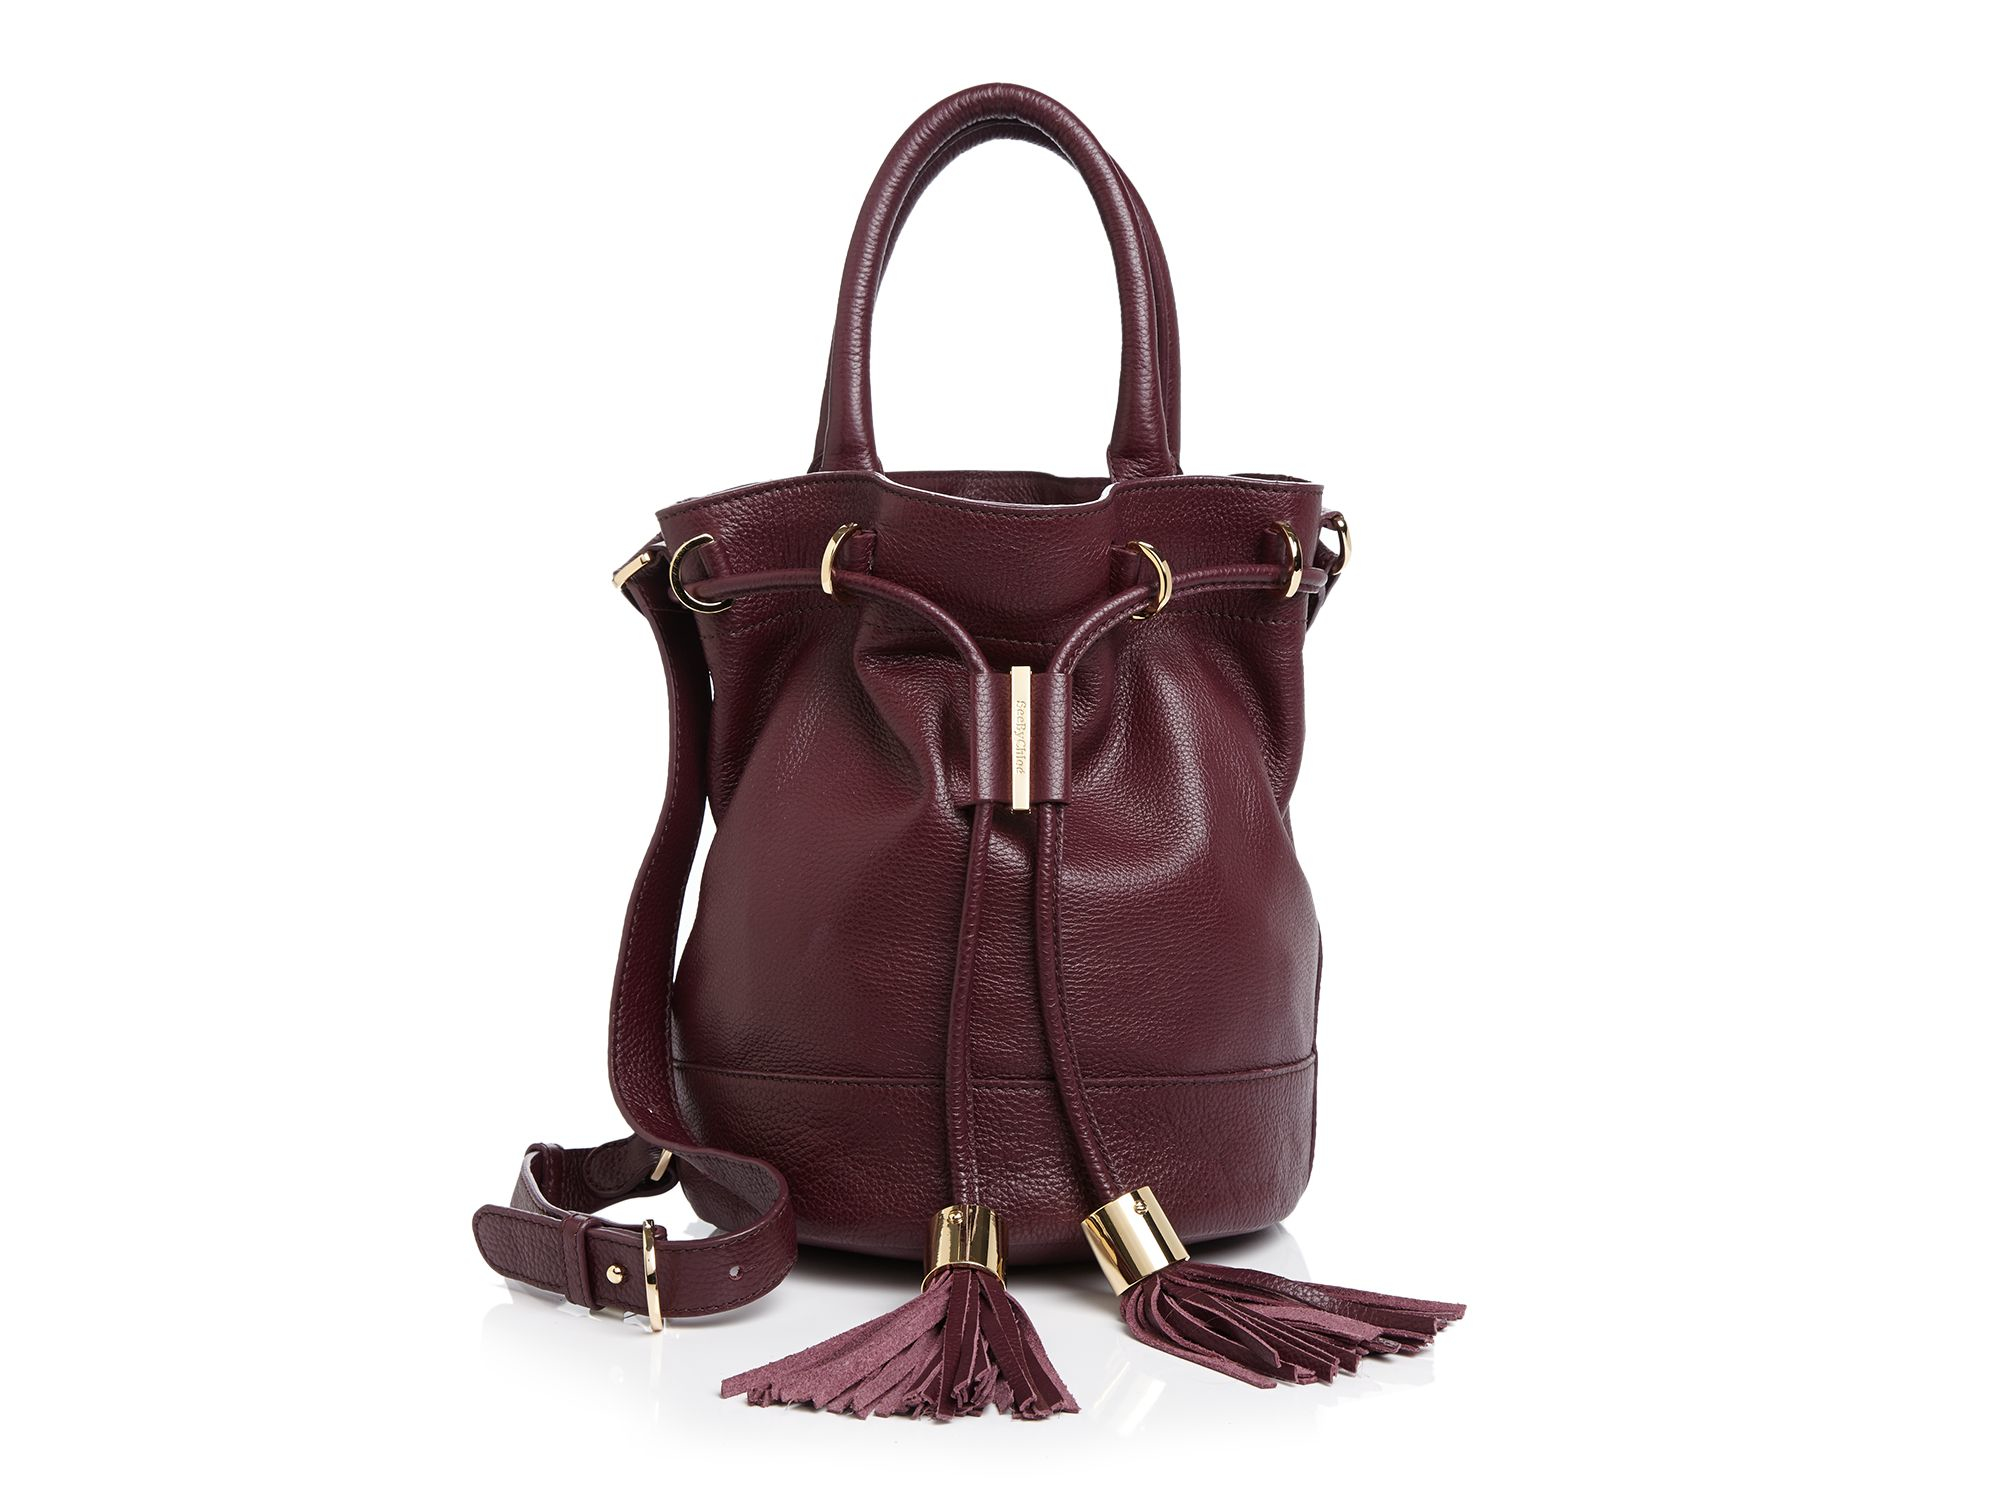 chloe see by chloe purse, replica chloe handbags